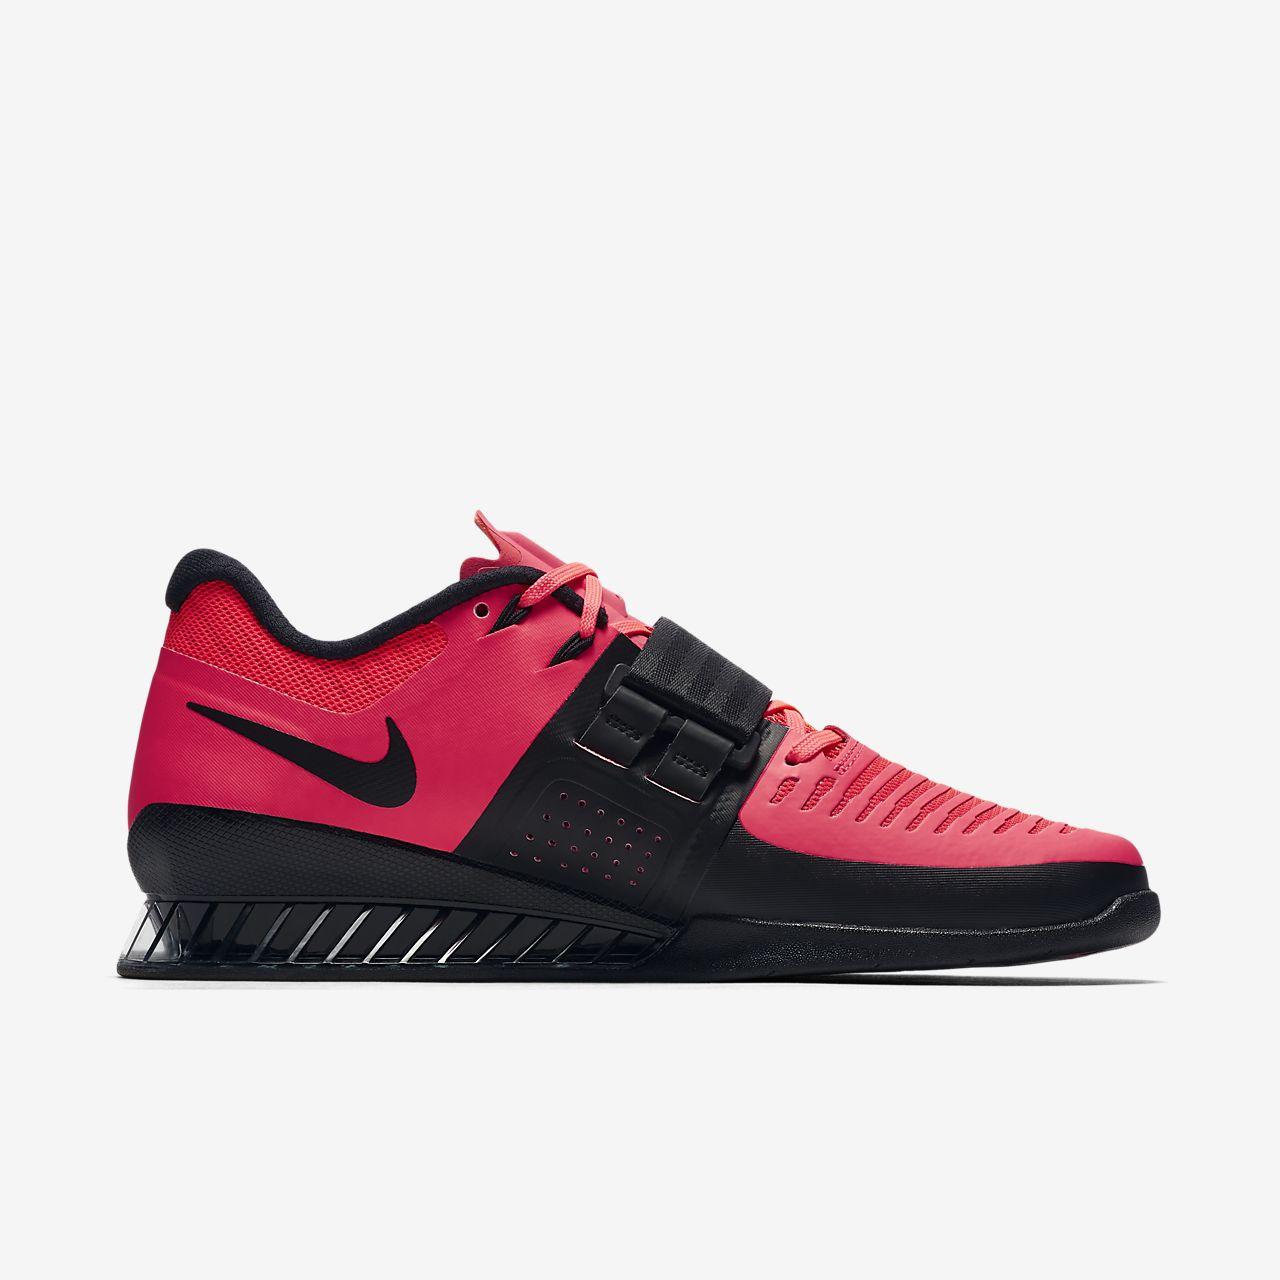 Nike Jordan Zapatillas de Entrenamiento Para Hombre, (White/Game Royal-Black), 9 D(M) US